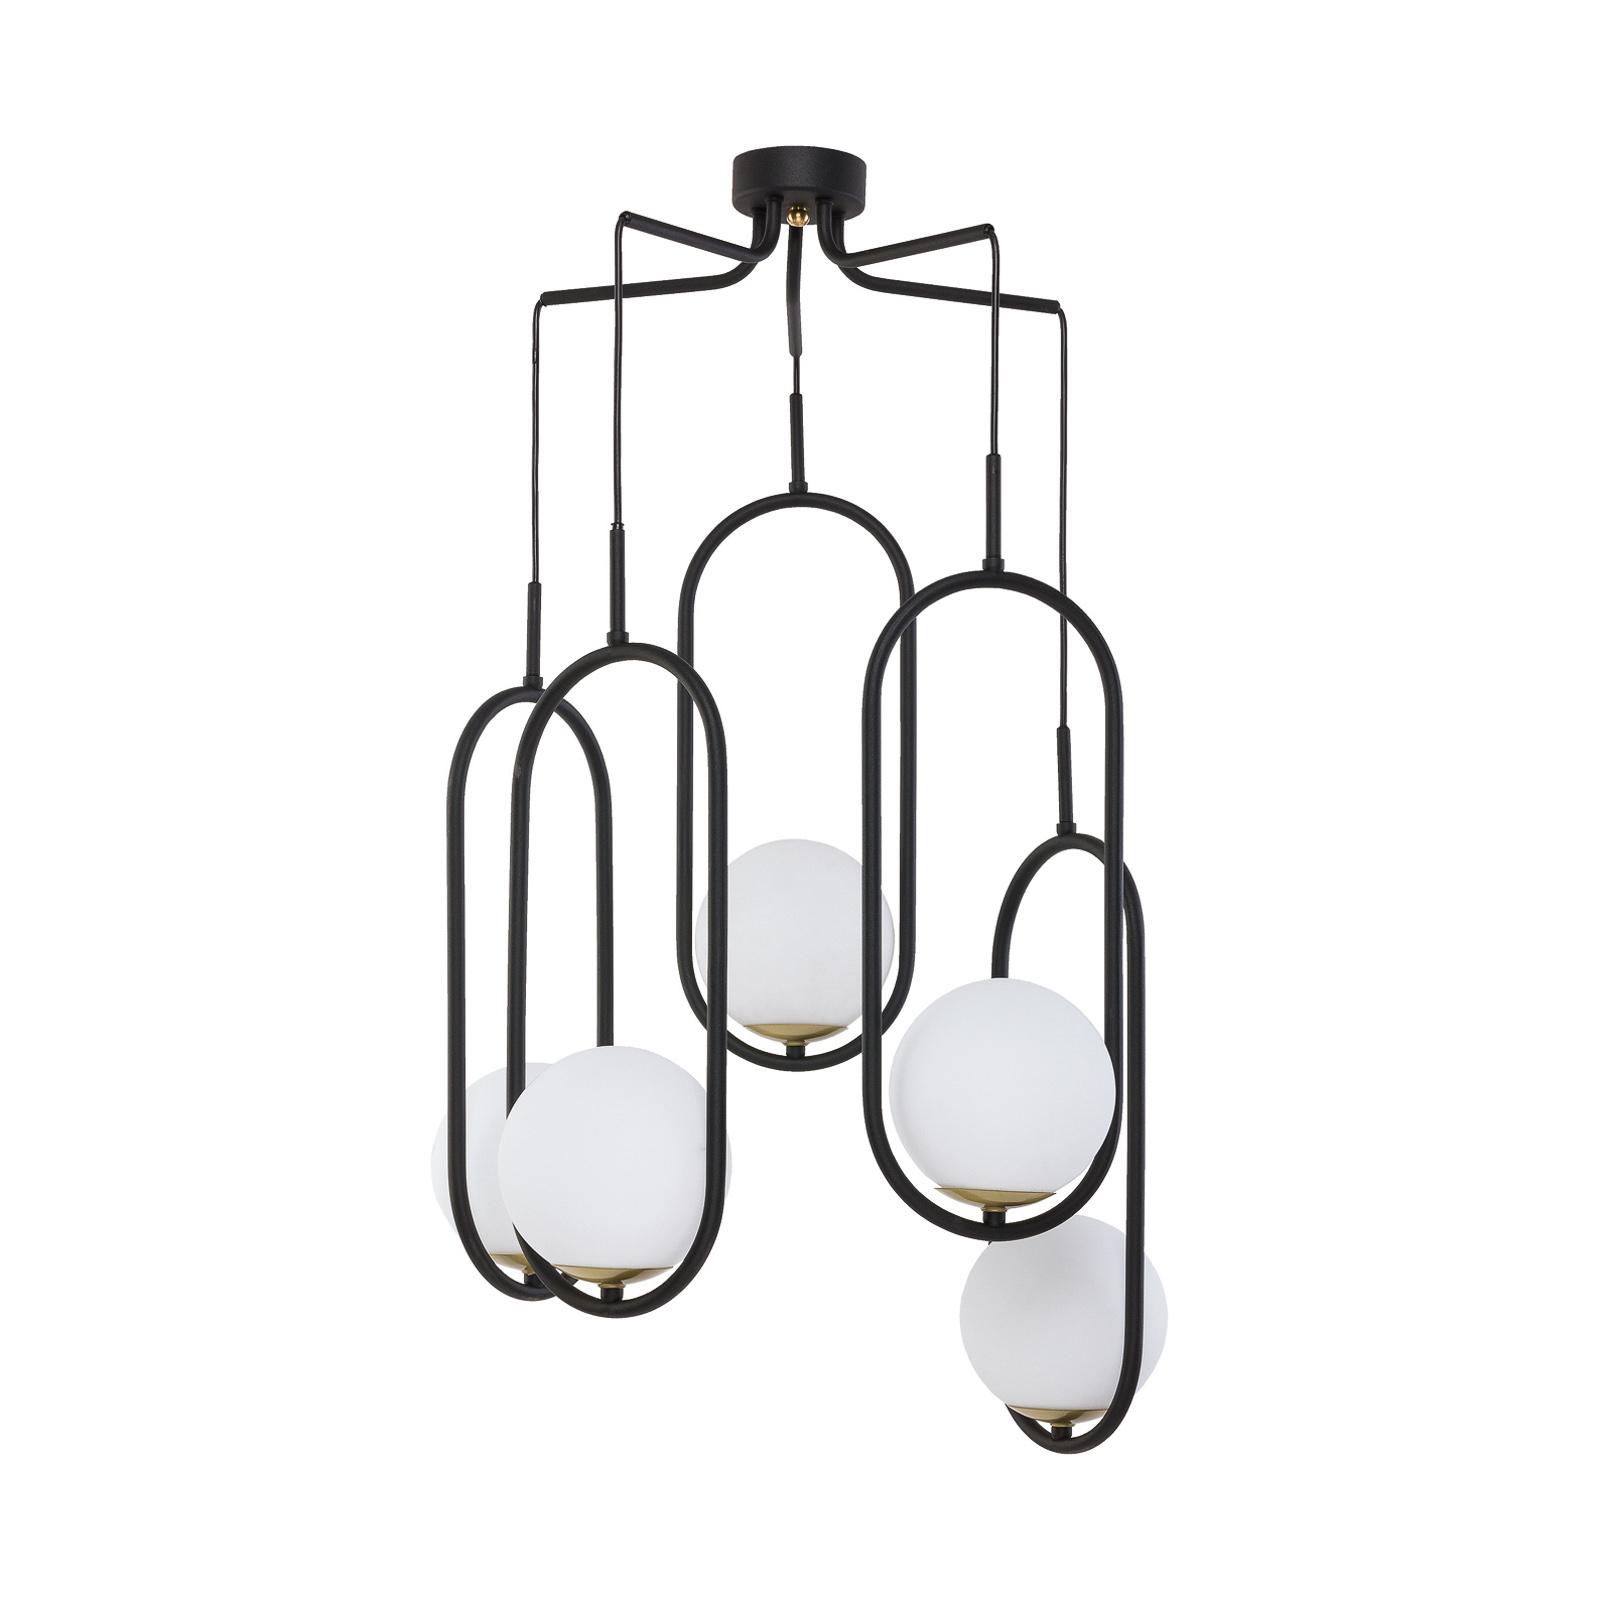 Hengelampe Samba, opalglass/svart, 5 lyskilder